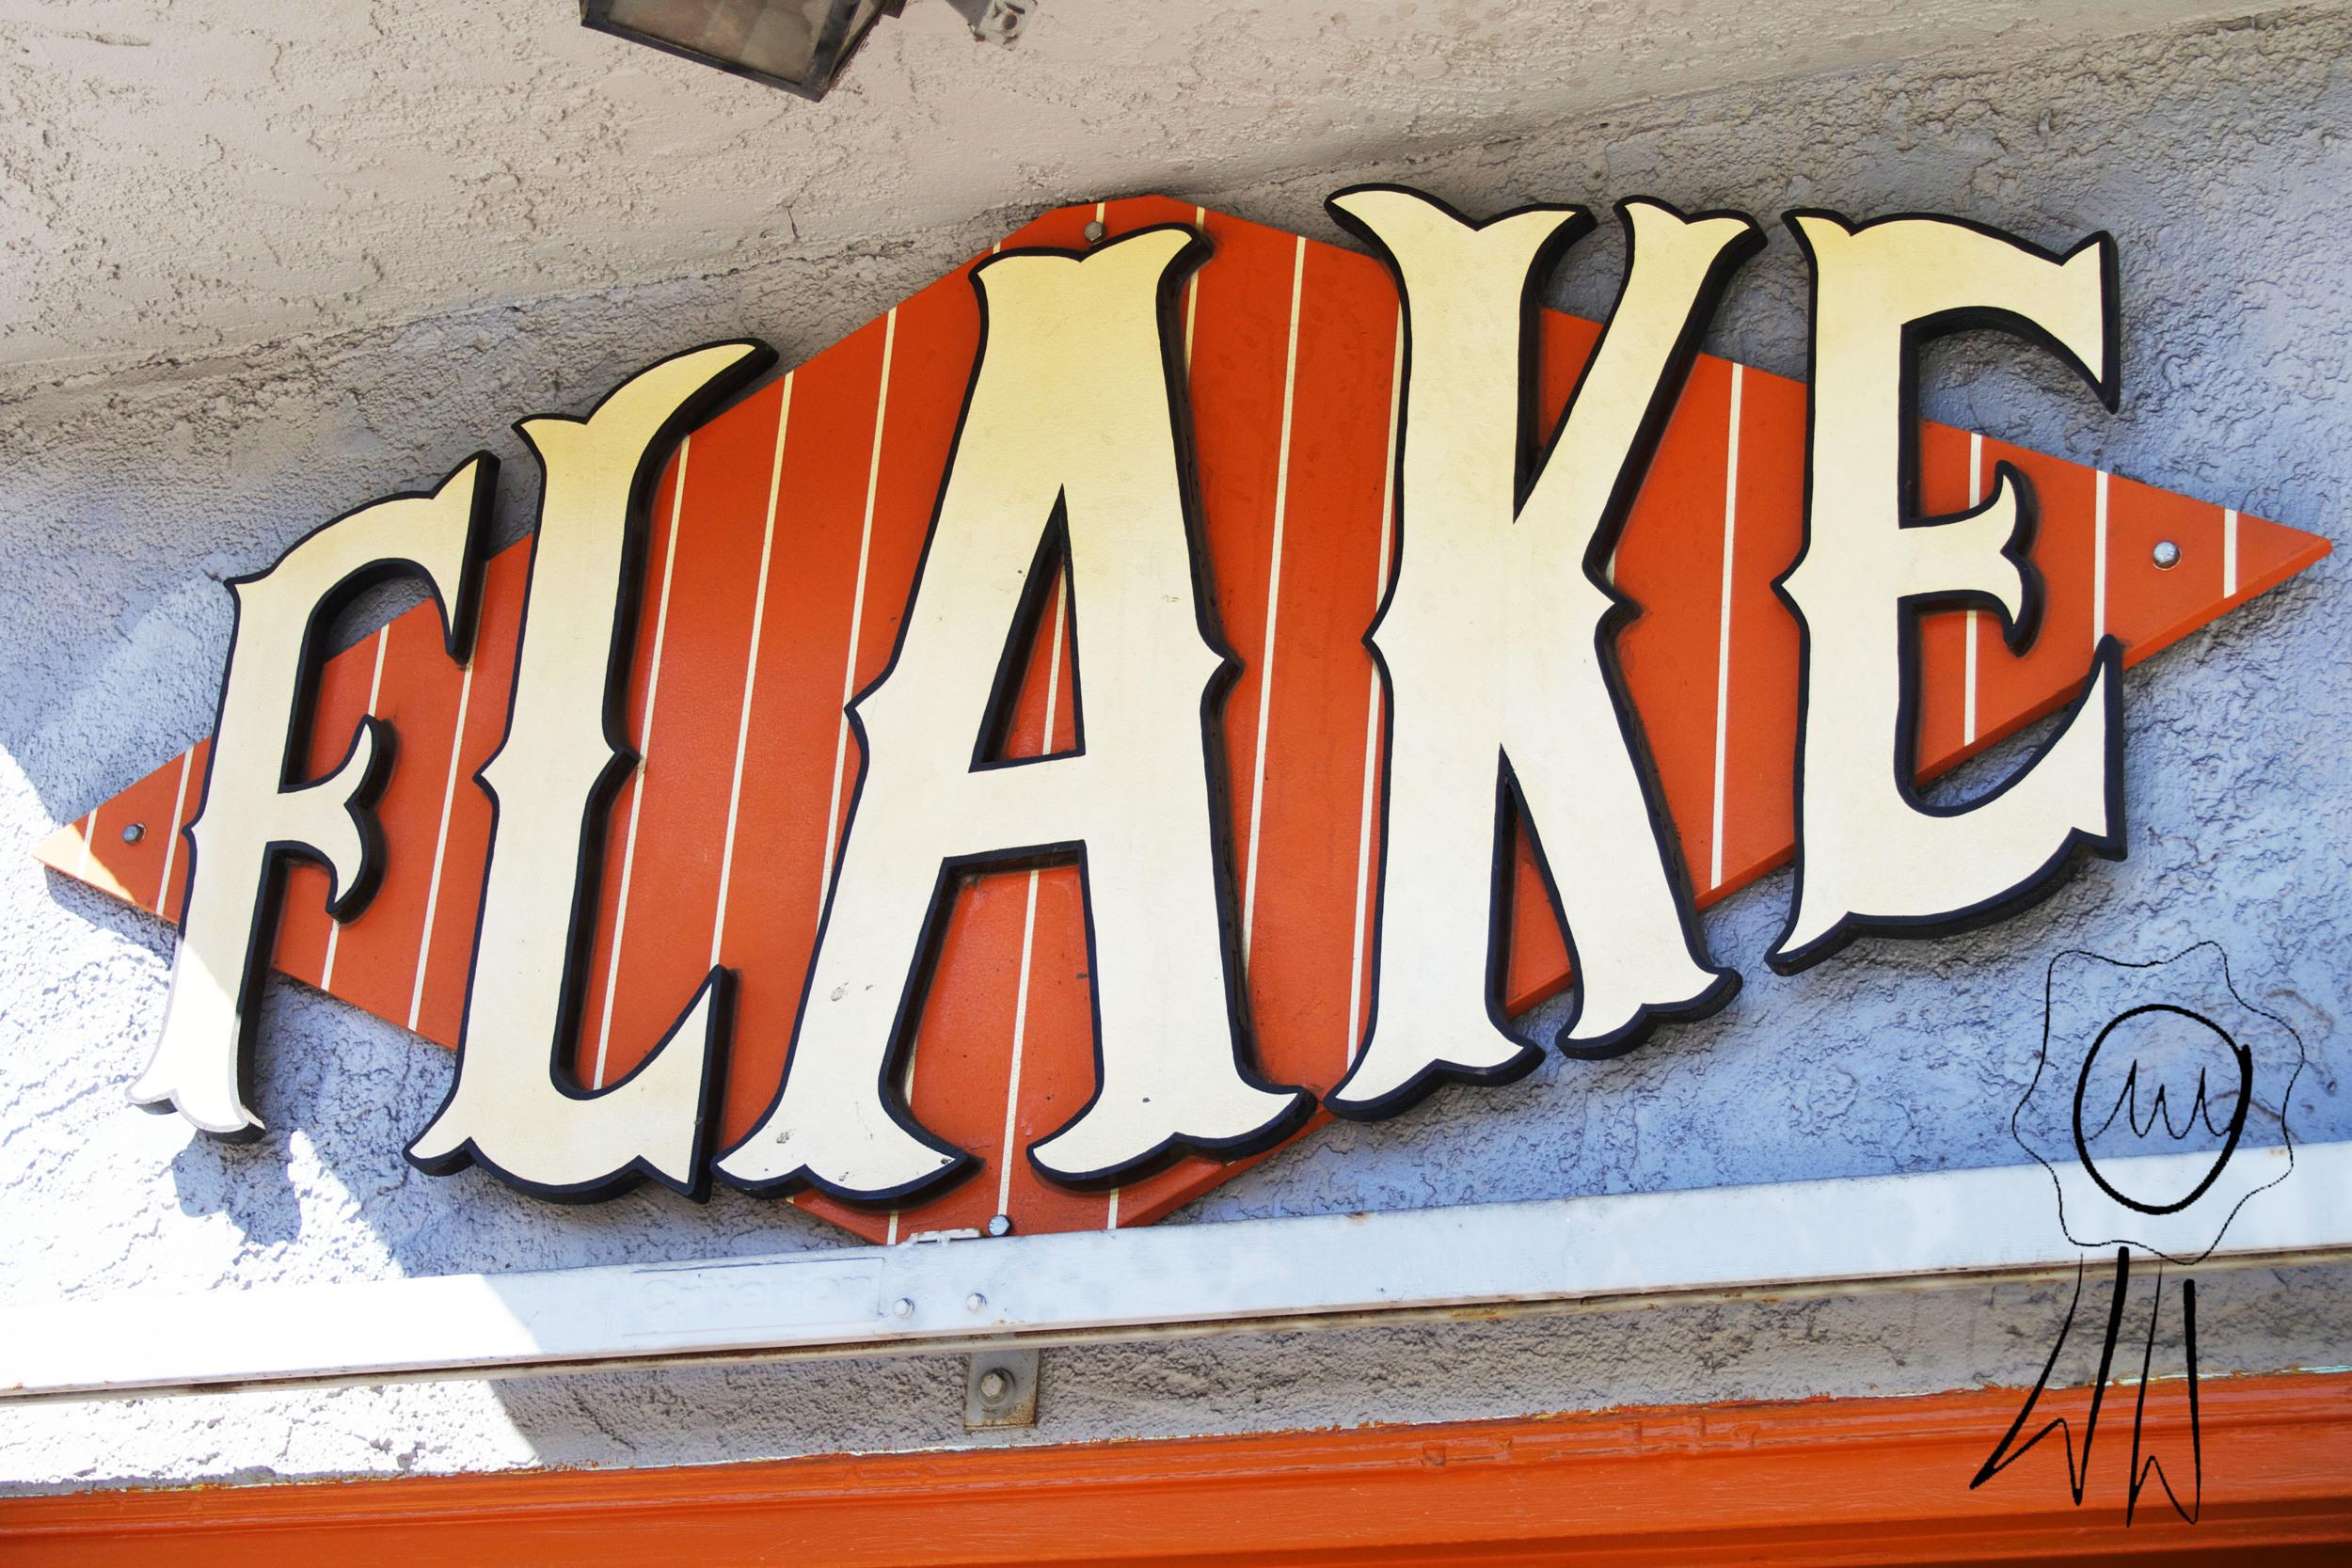 Flake westie sign.jpg